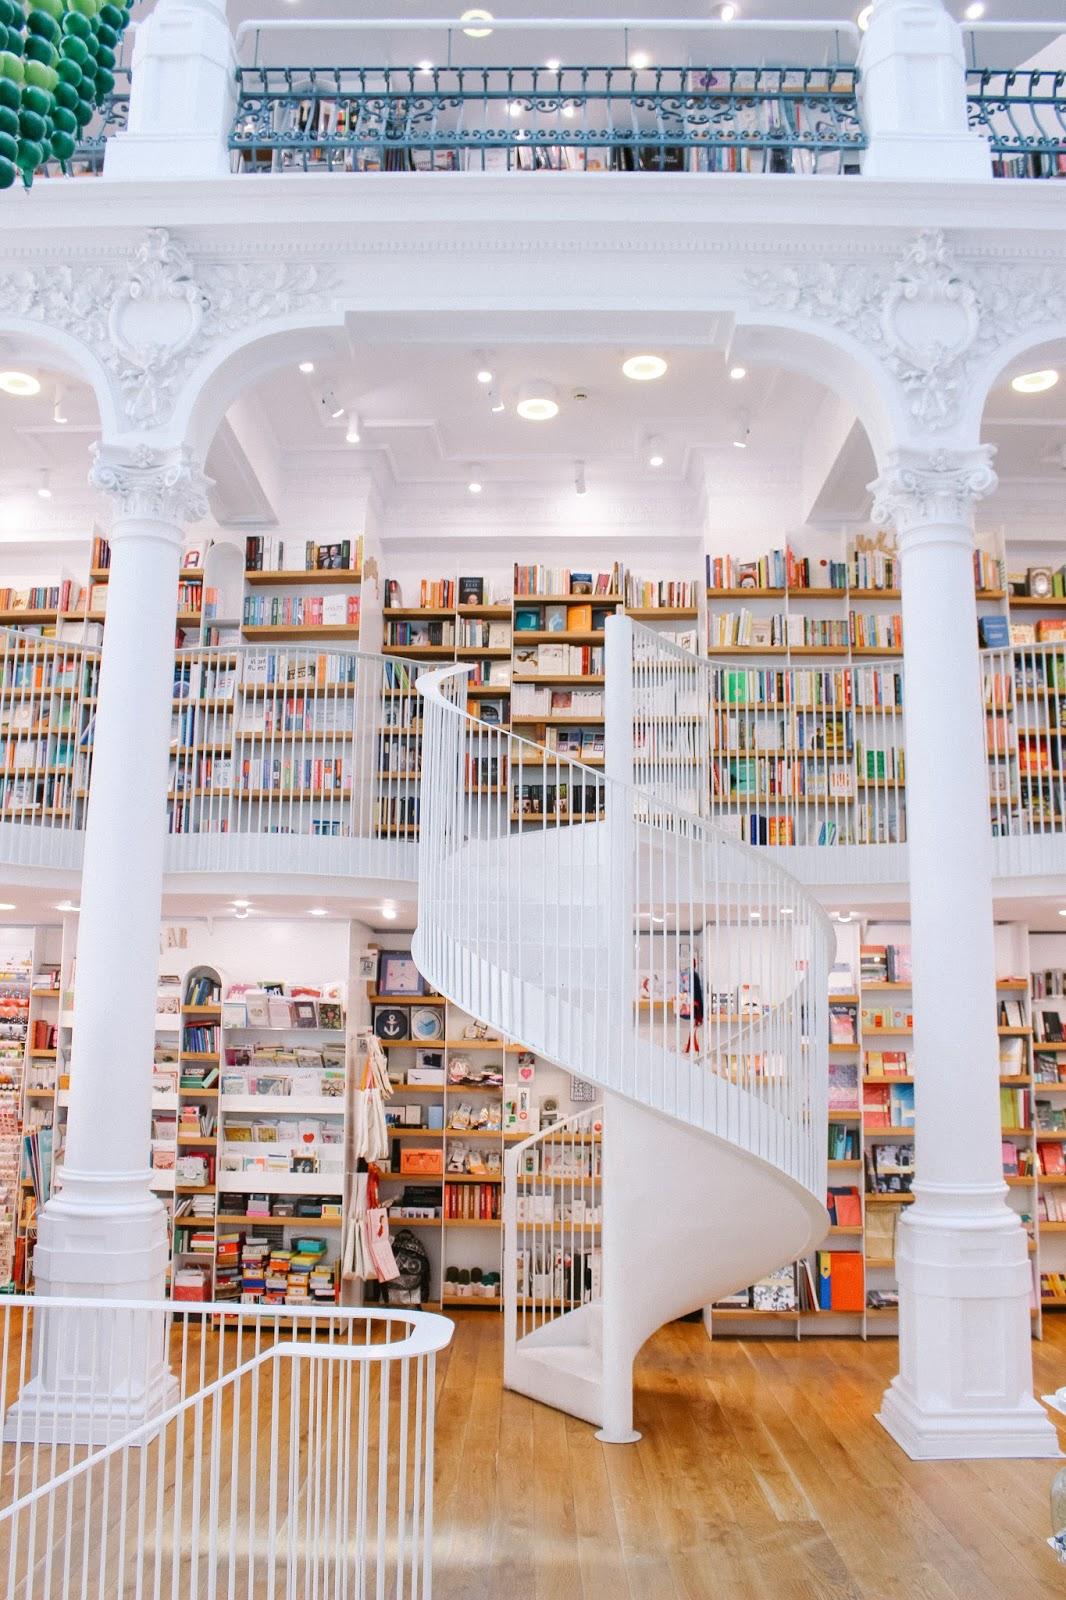 Carturesti Bookshop in Bucharest